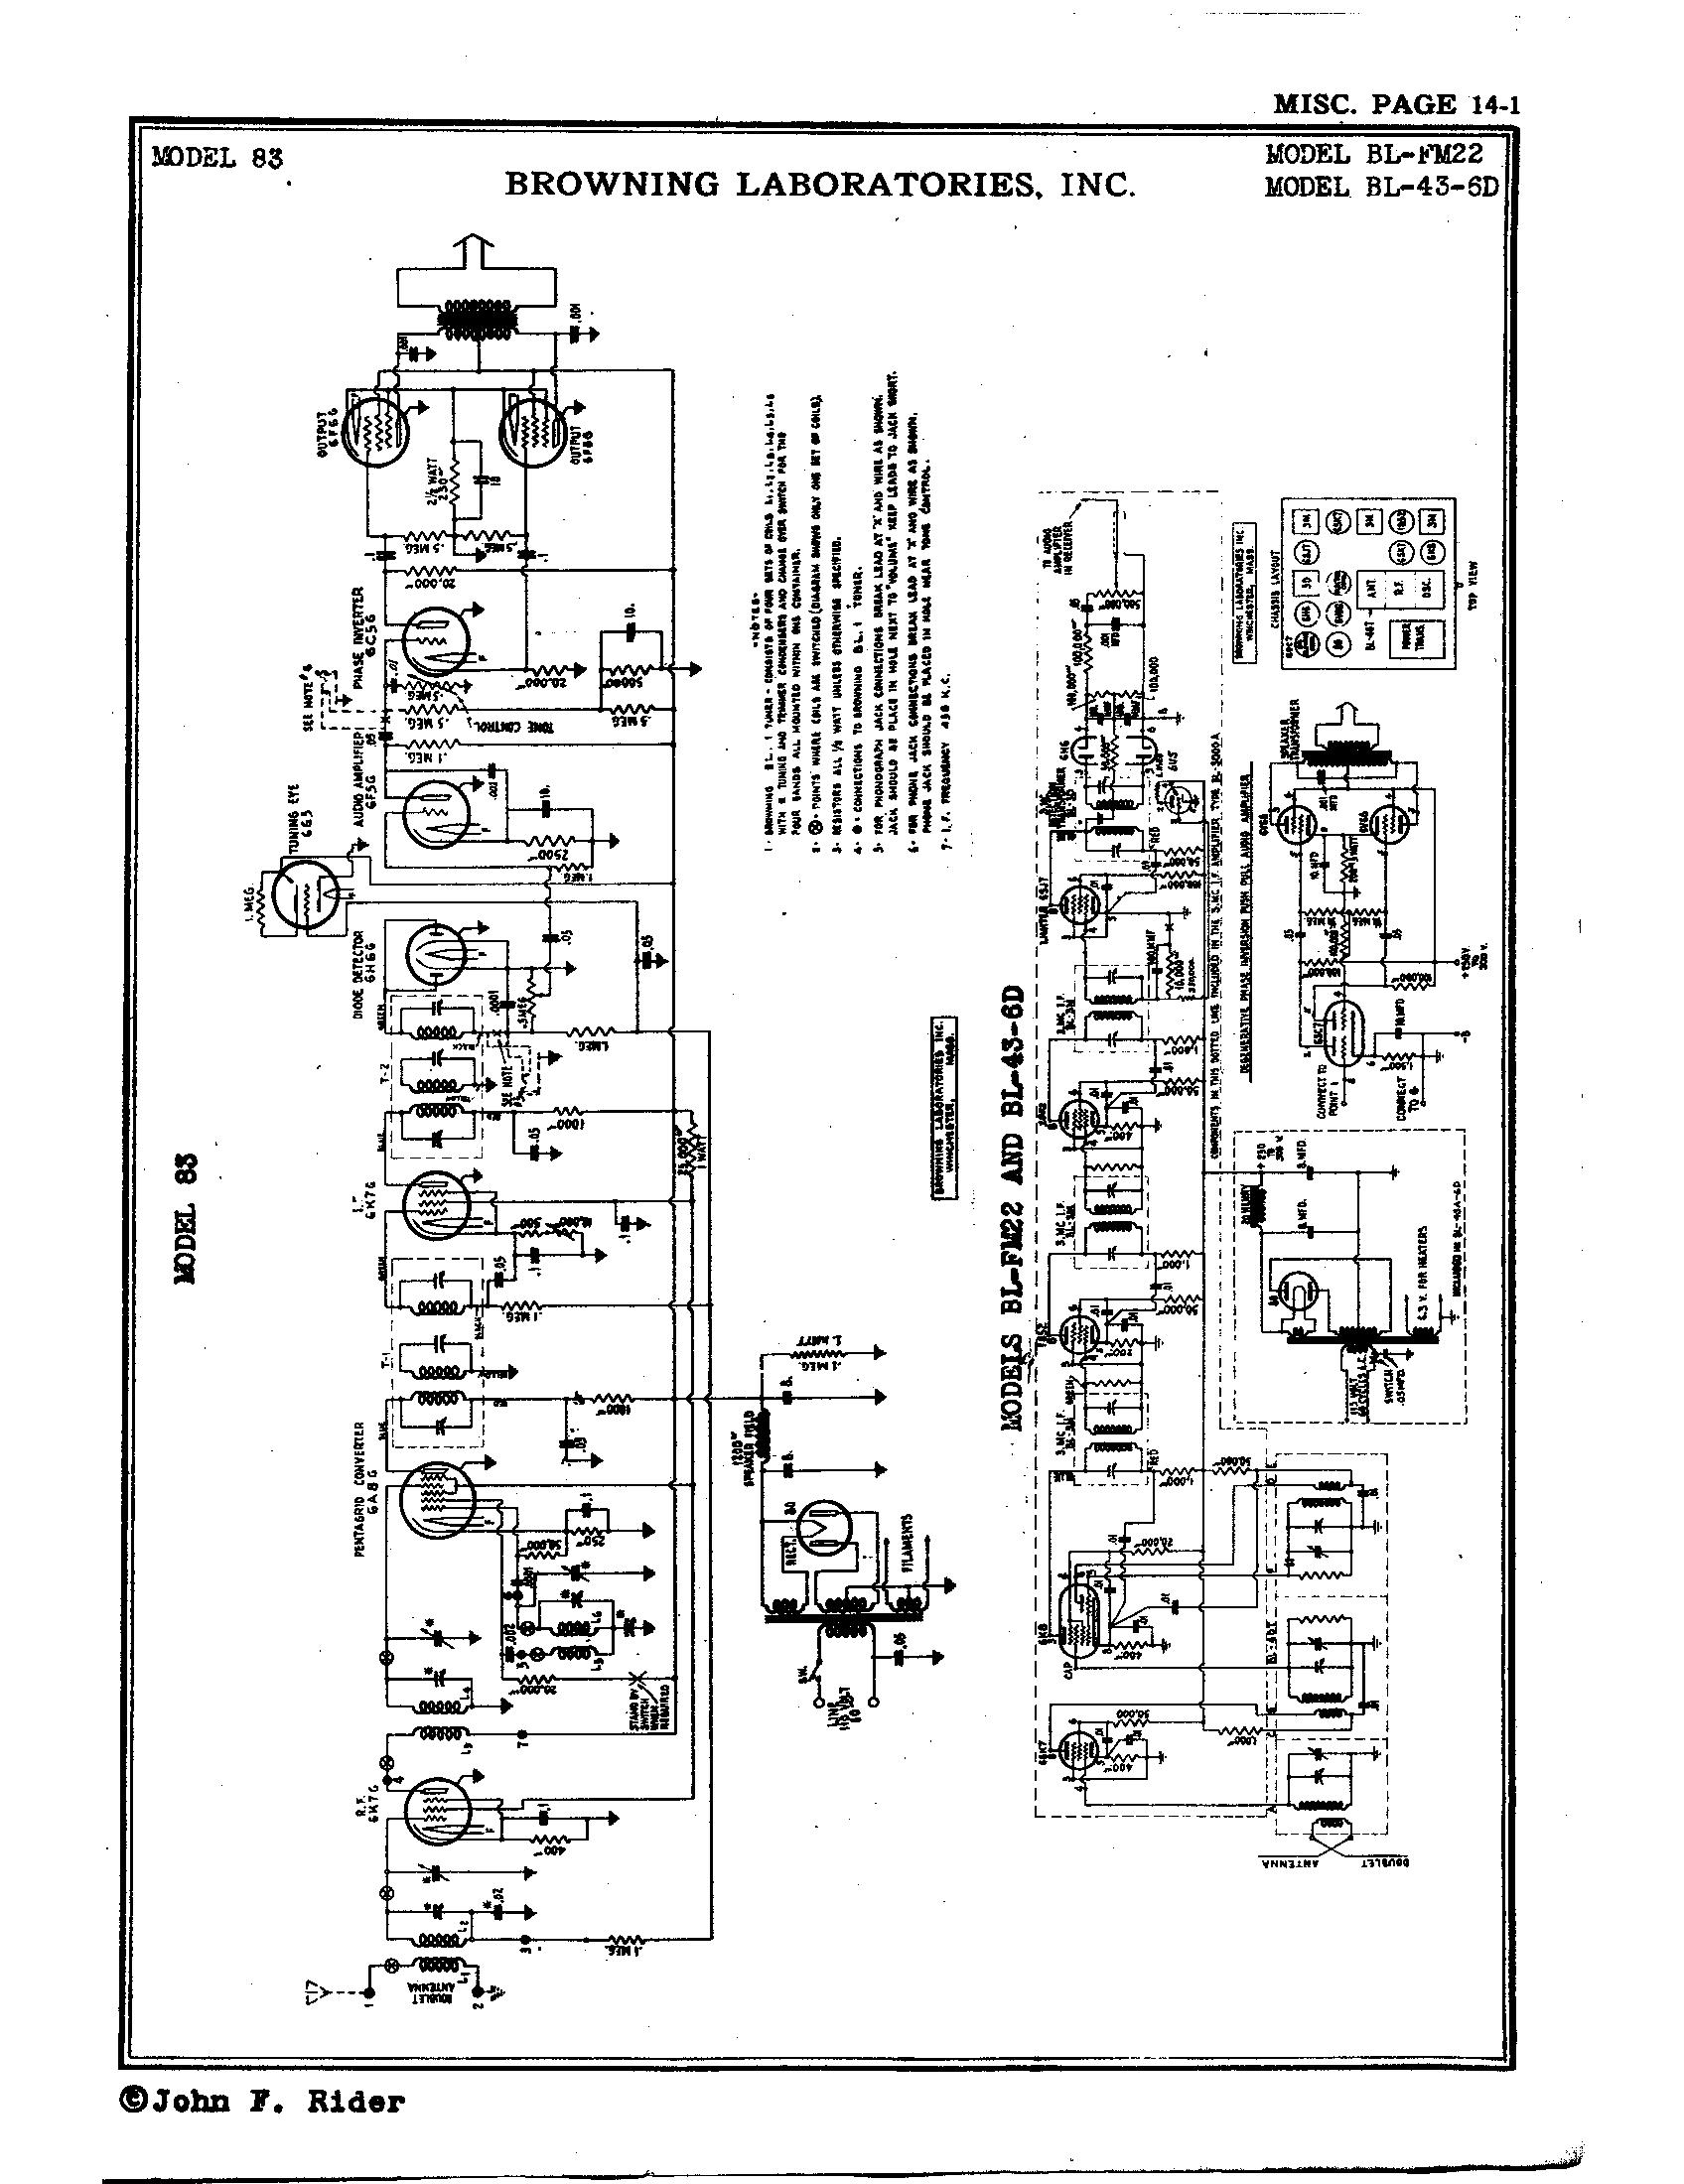 browning laboratories  inc  bl